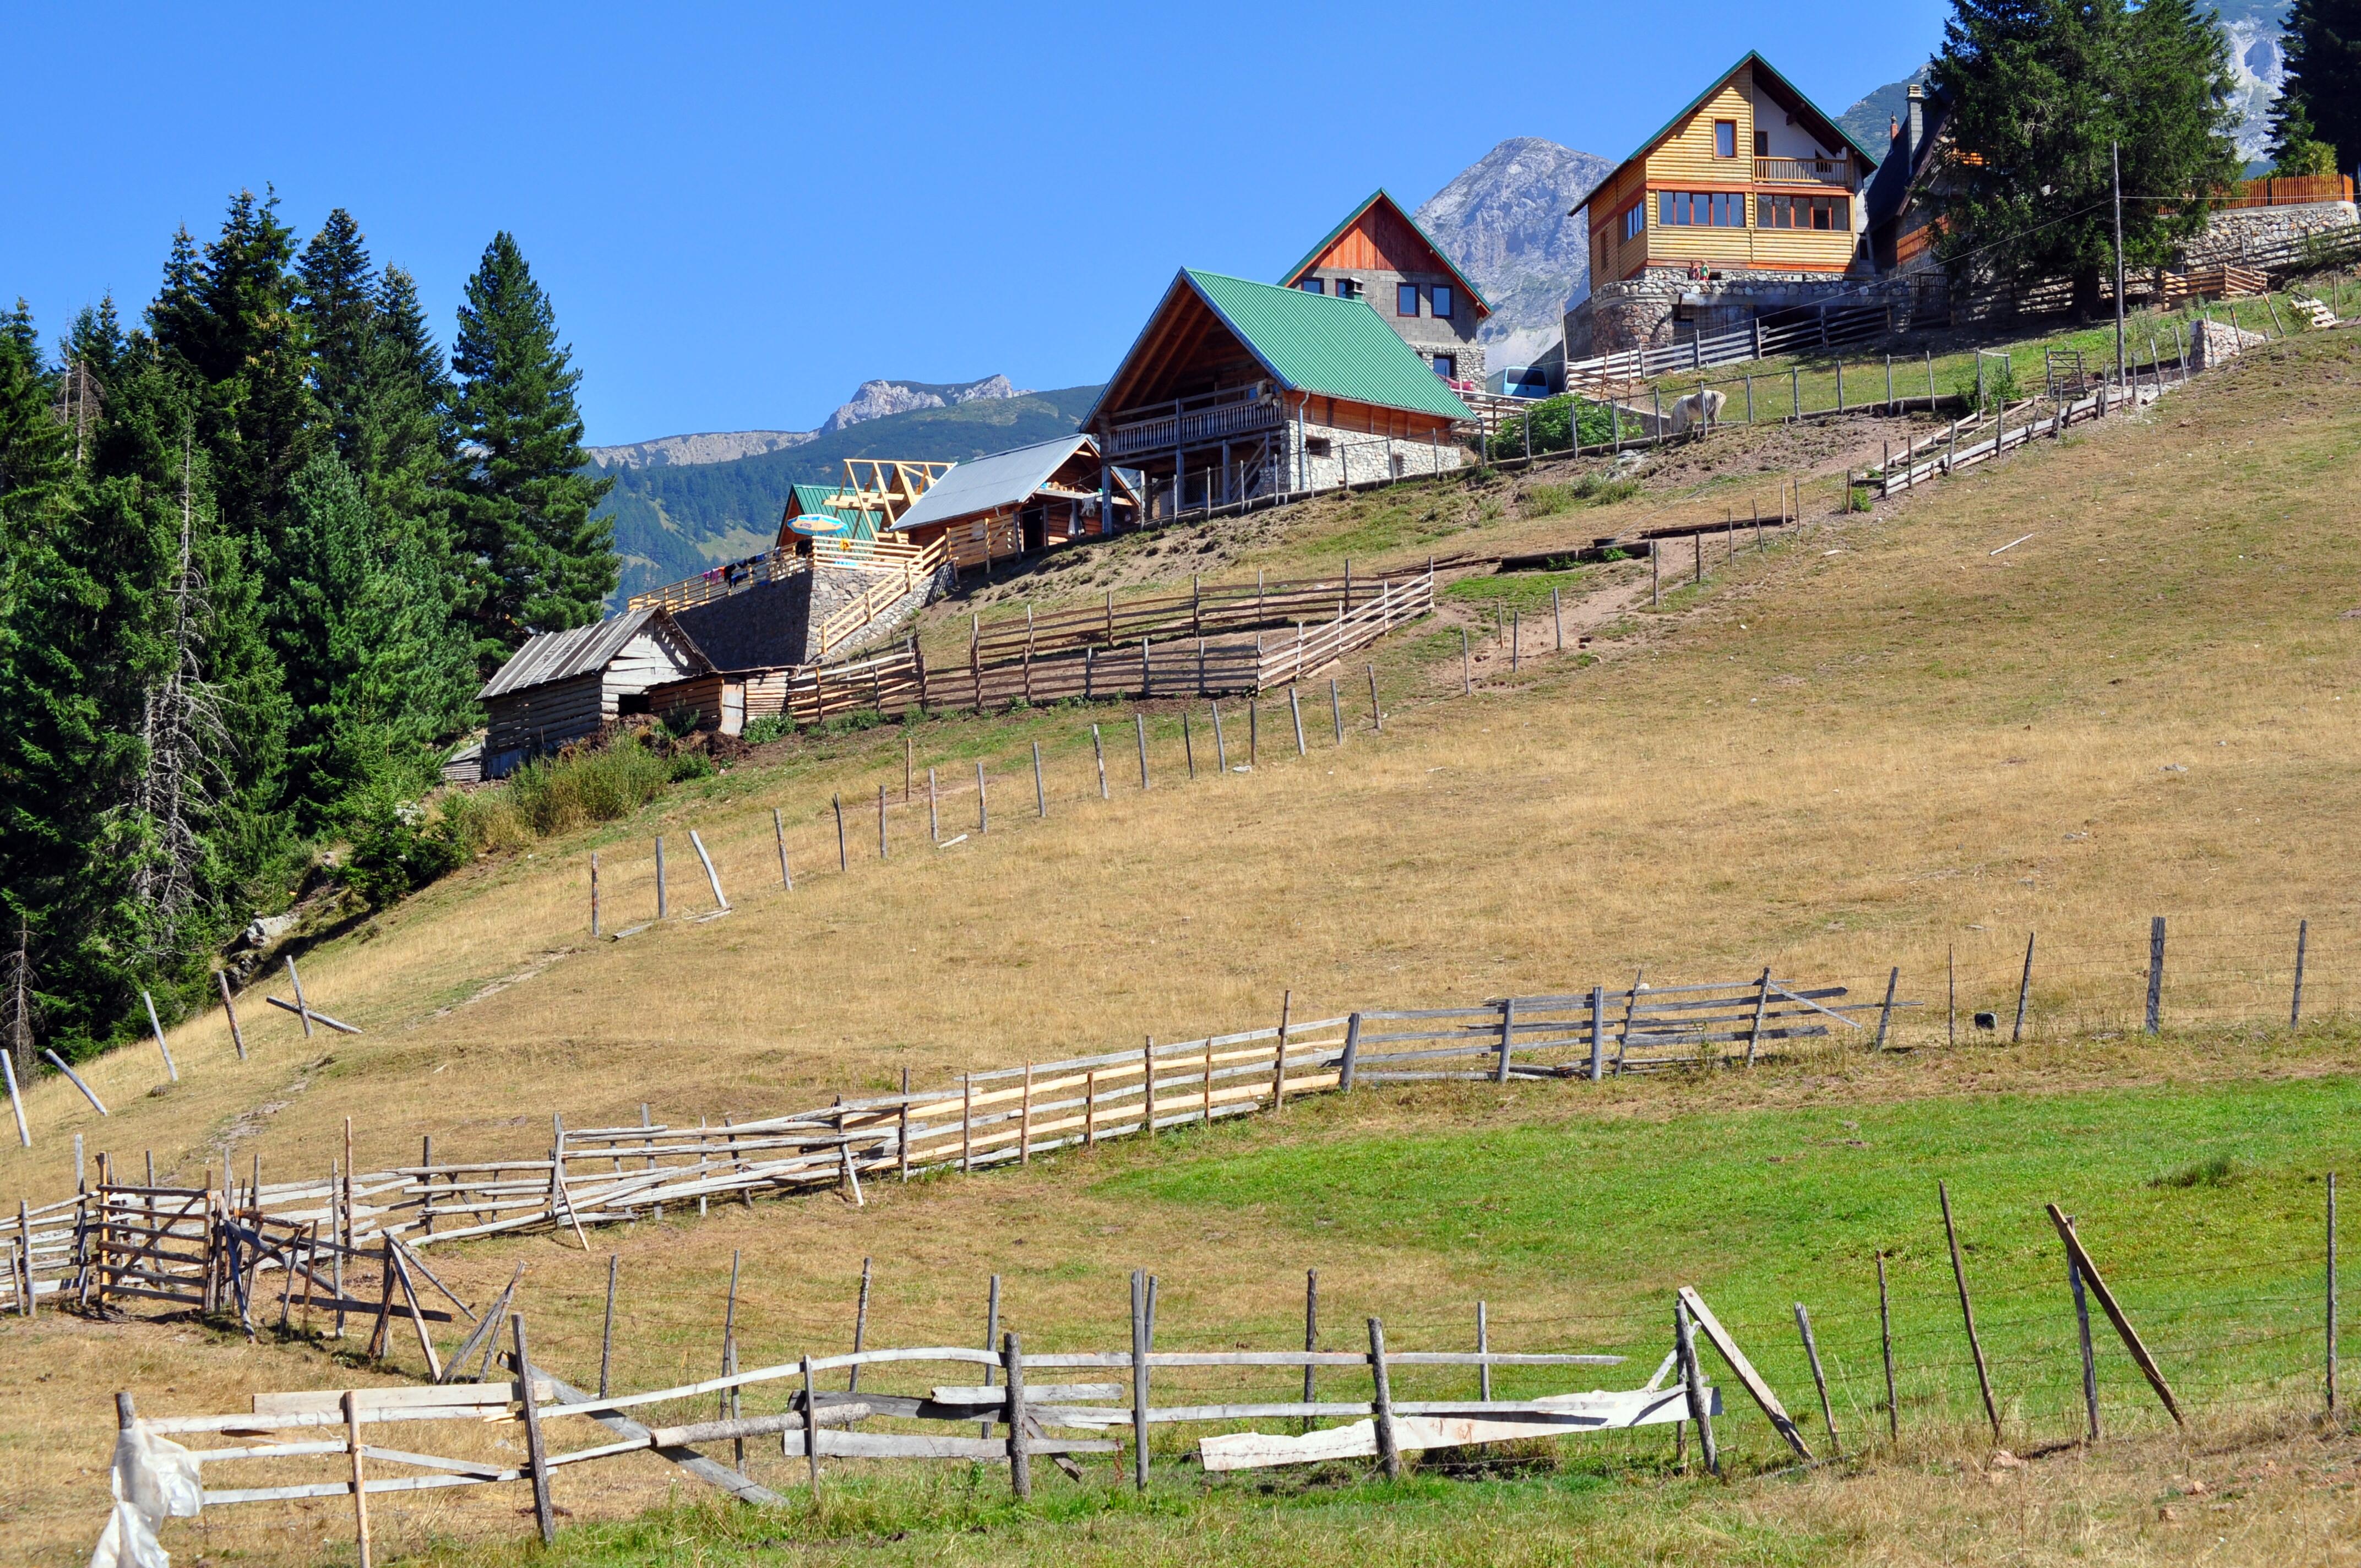 A beautiful cabin